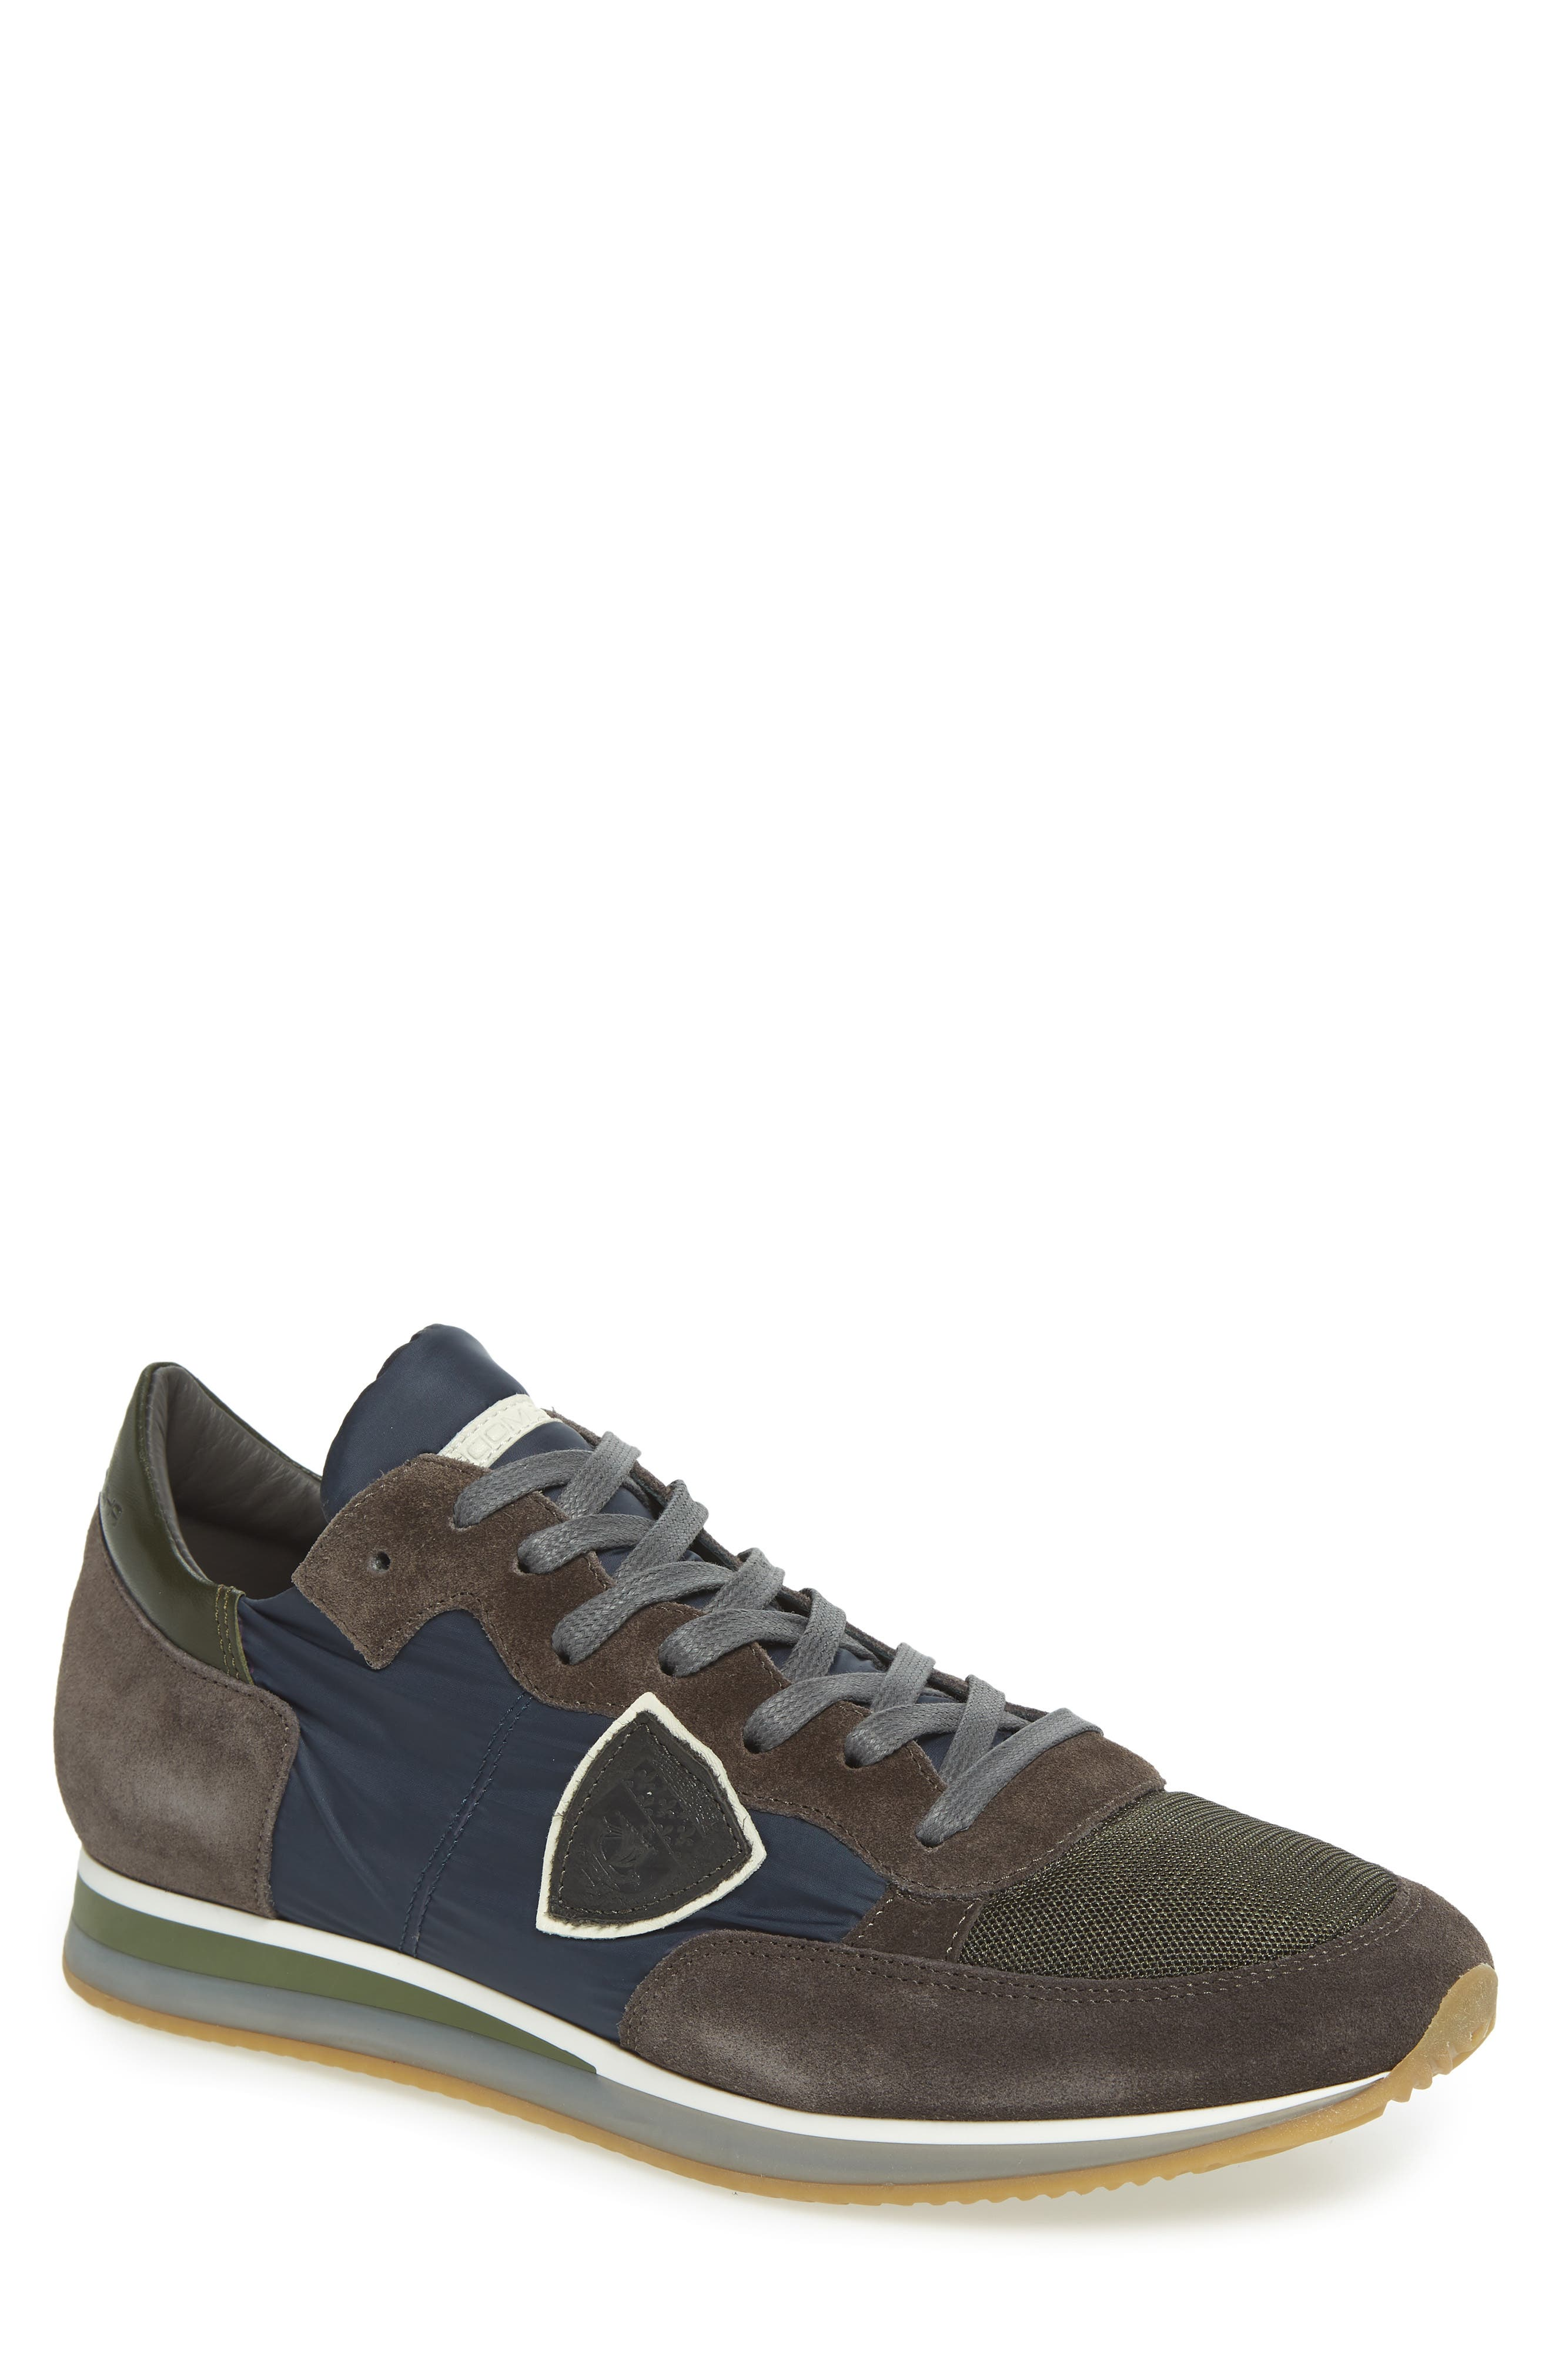 Tropez Low Top Sneaker,                         Main,                         color, 020